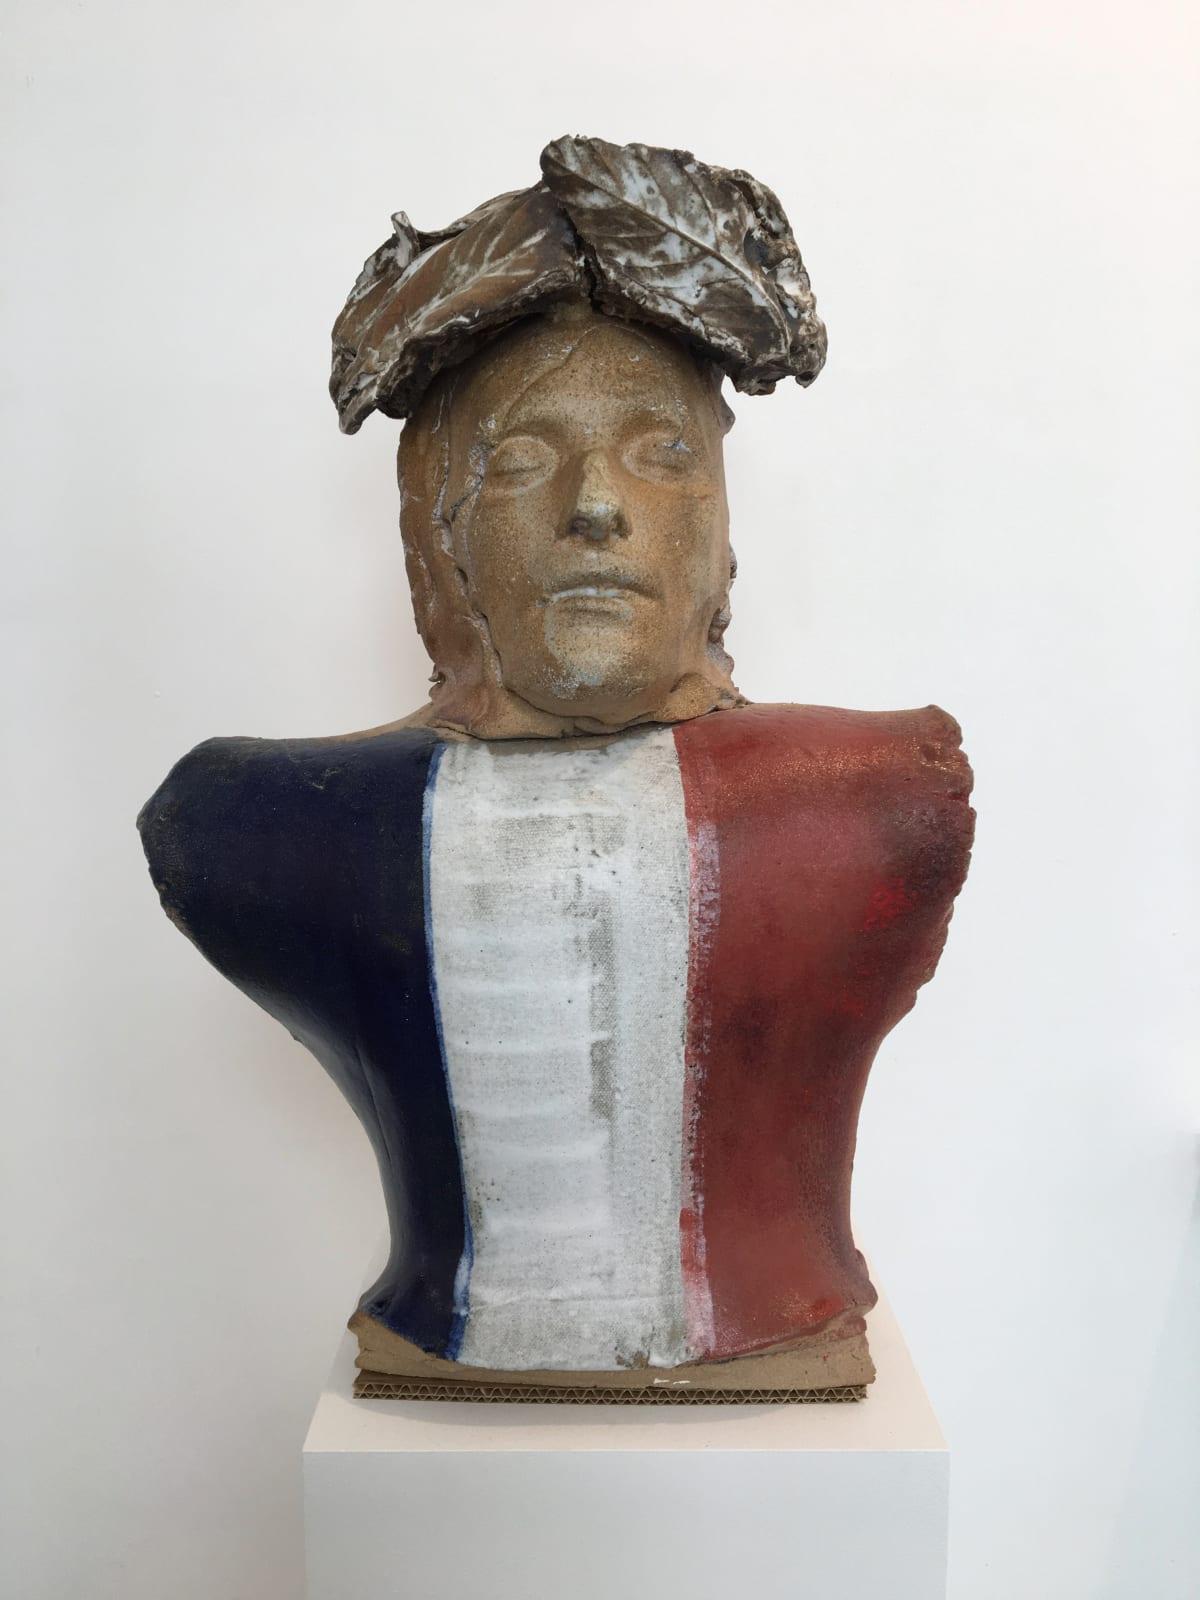 Marcus Harvey Napoleon Nobilis, 2018 Glazed stoneware 60 x 42 x 23 cm